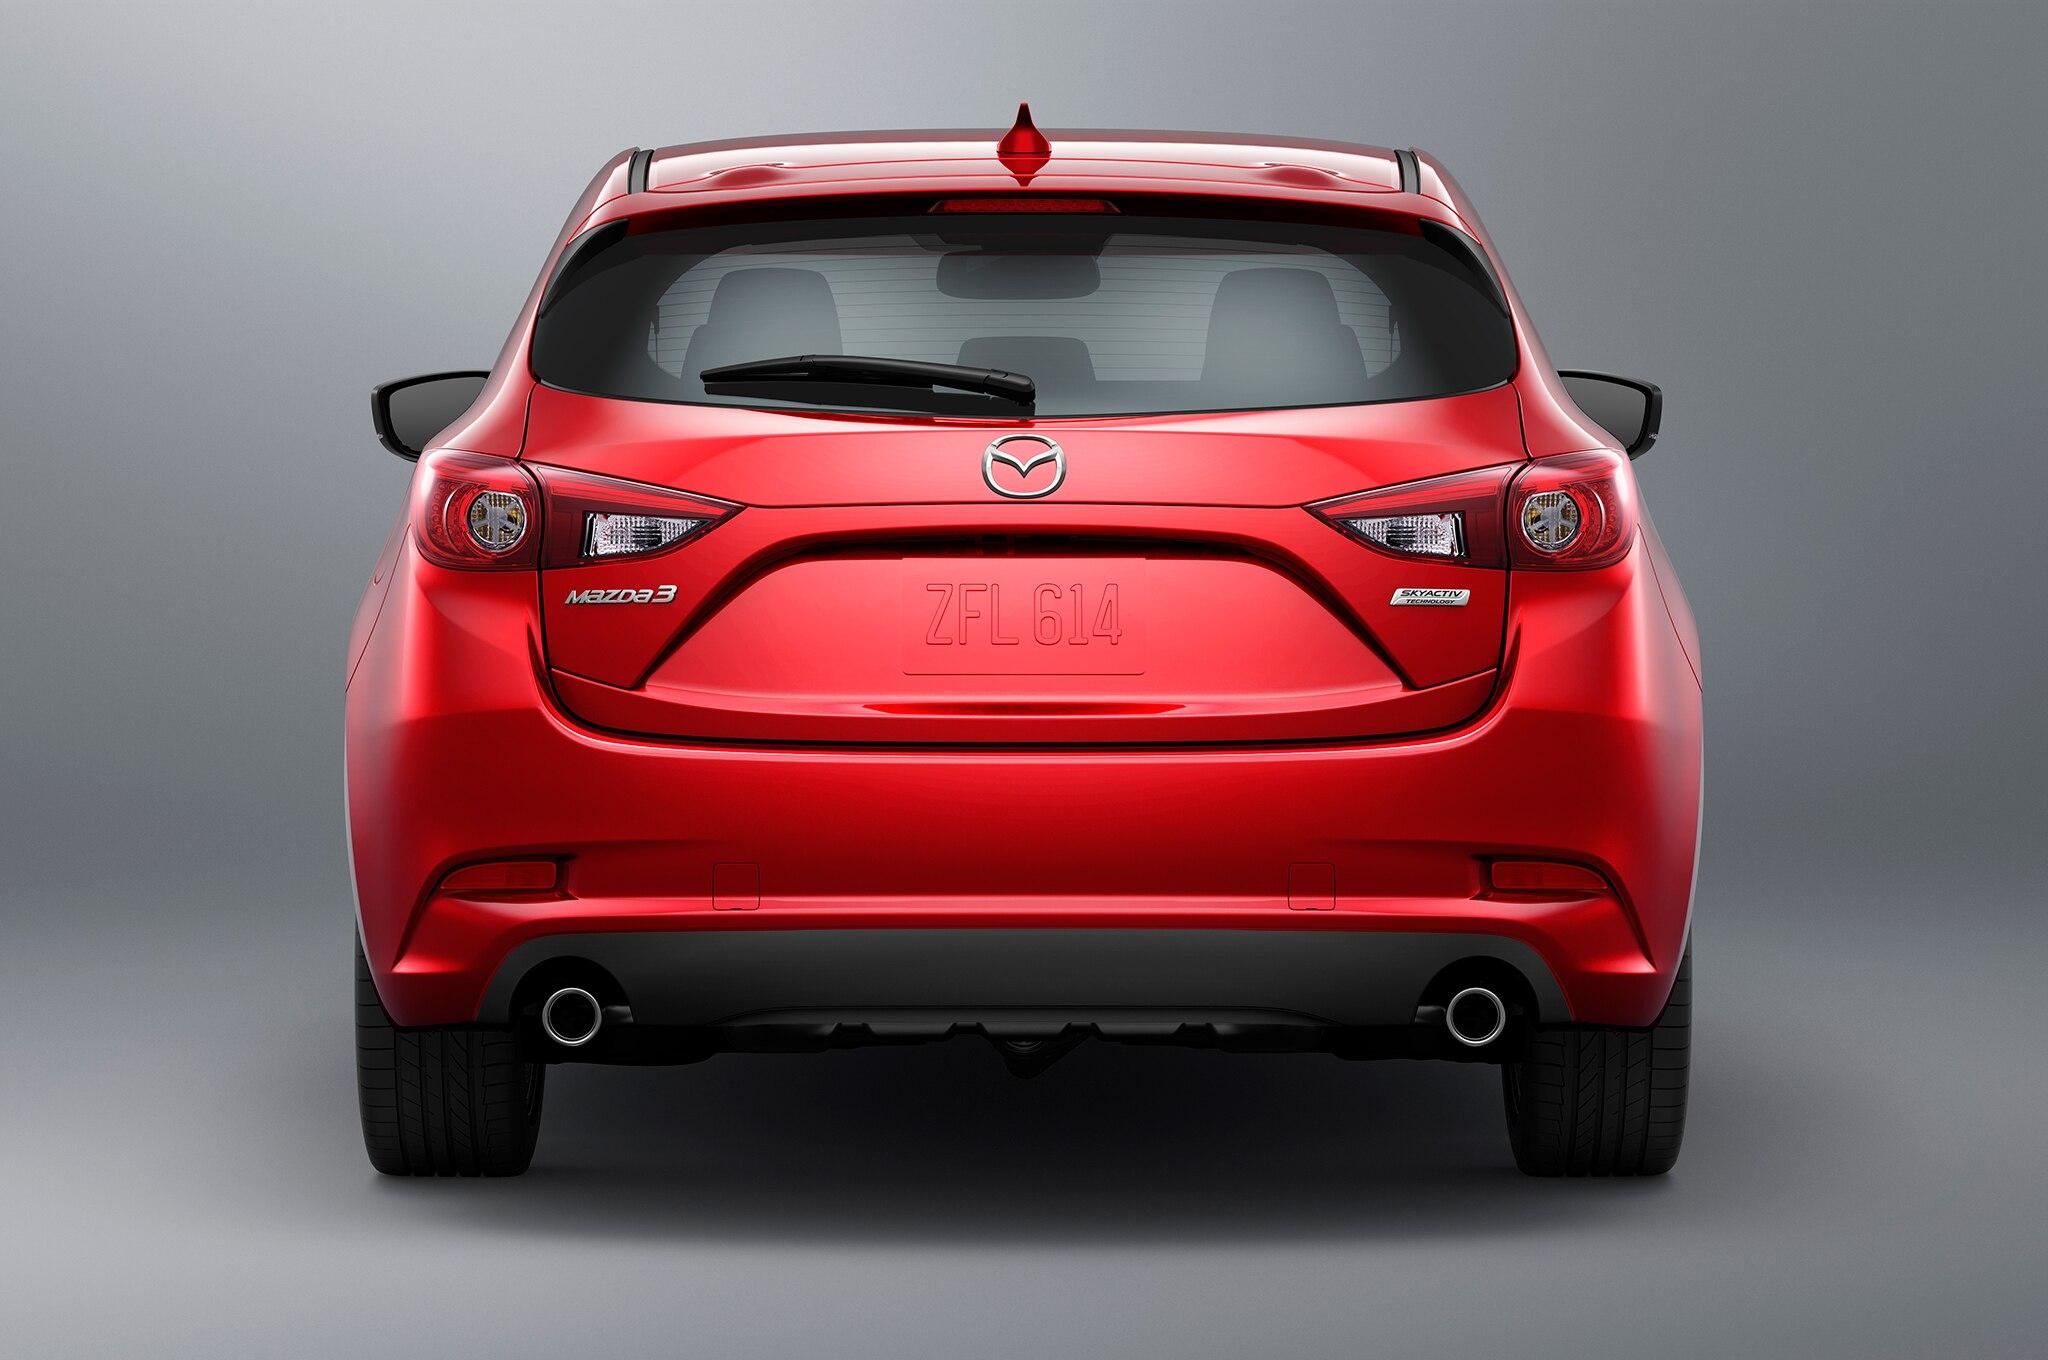 2017 Mazda3 Refreshed With Visual Tweaks, G-Vectoring ...